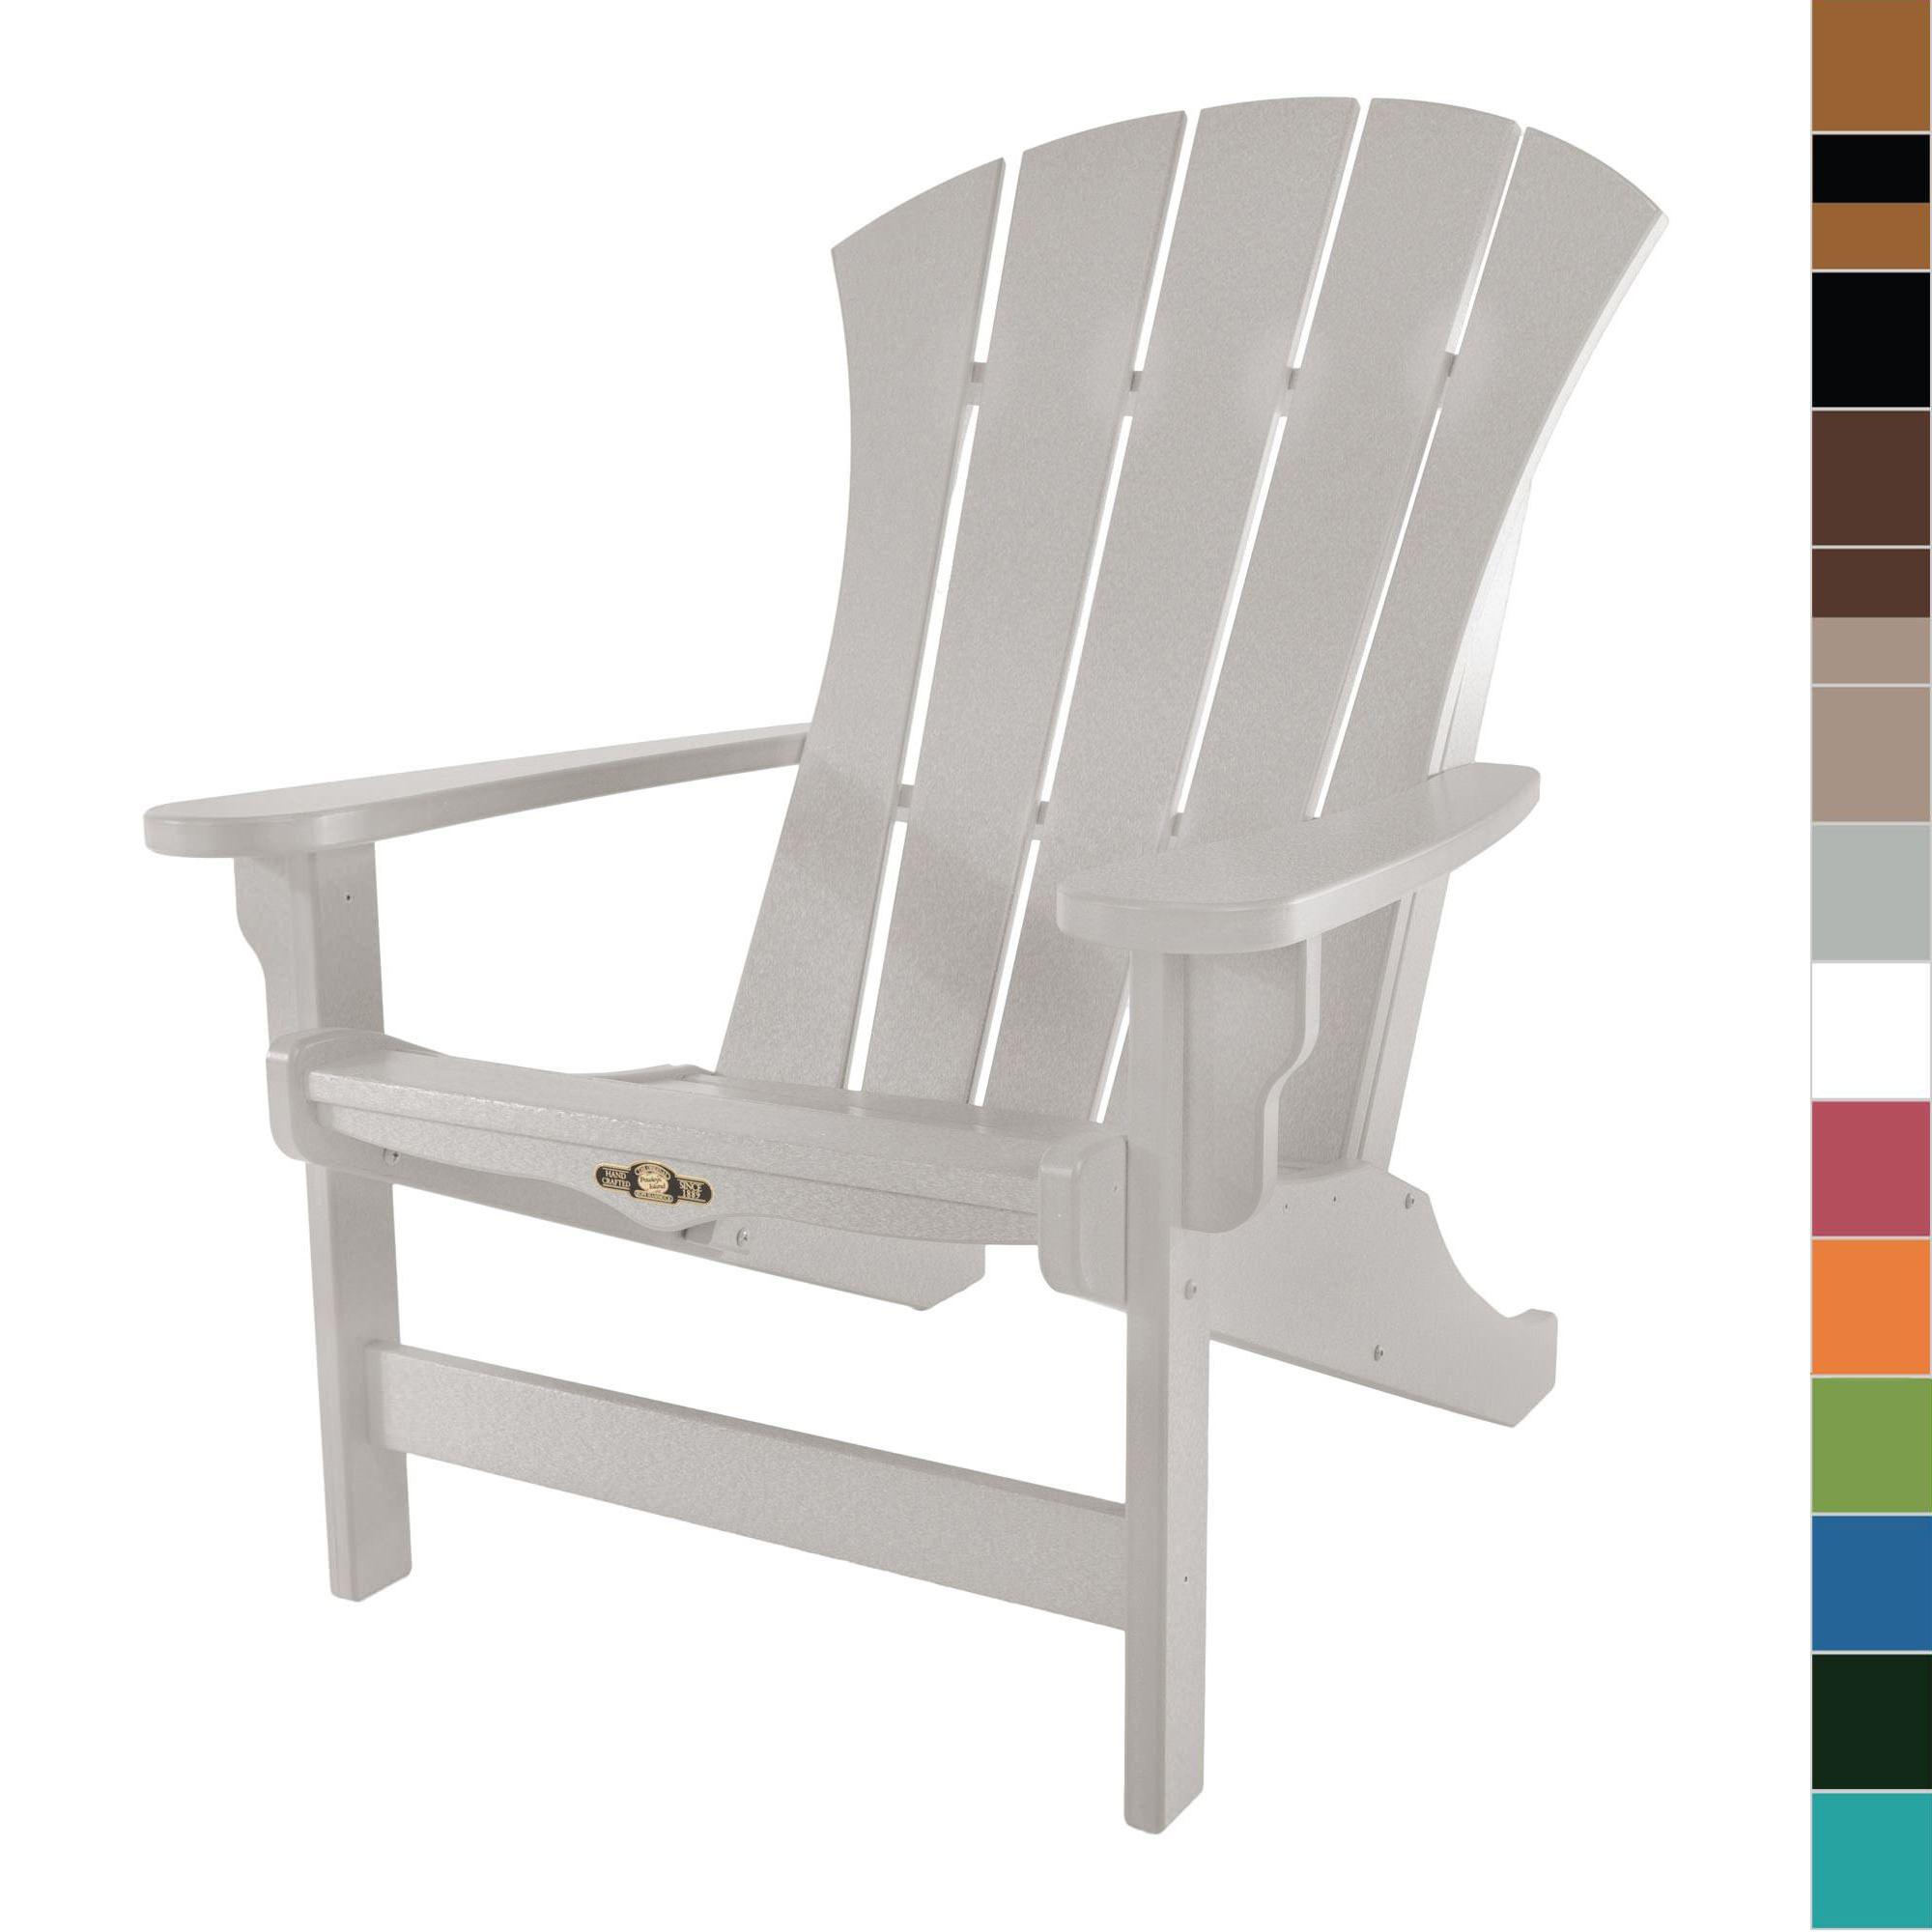 Pleasant Welcome To Pawleys Island Hammocks Lamtechconsult Wood Chair Design Ideas Lamtechconsultcom